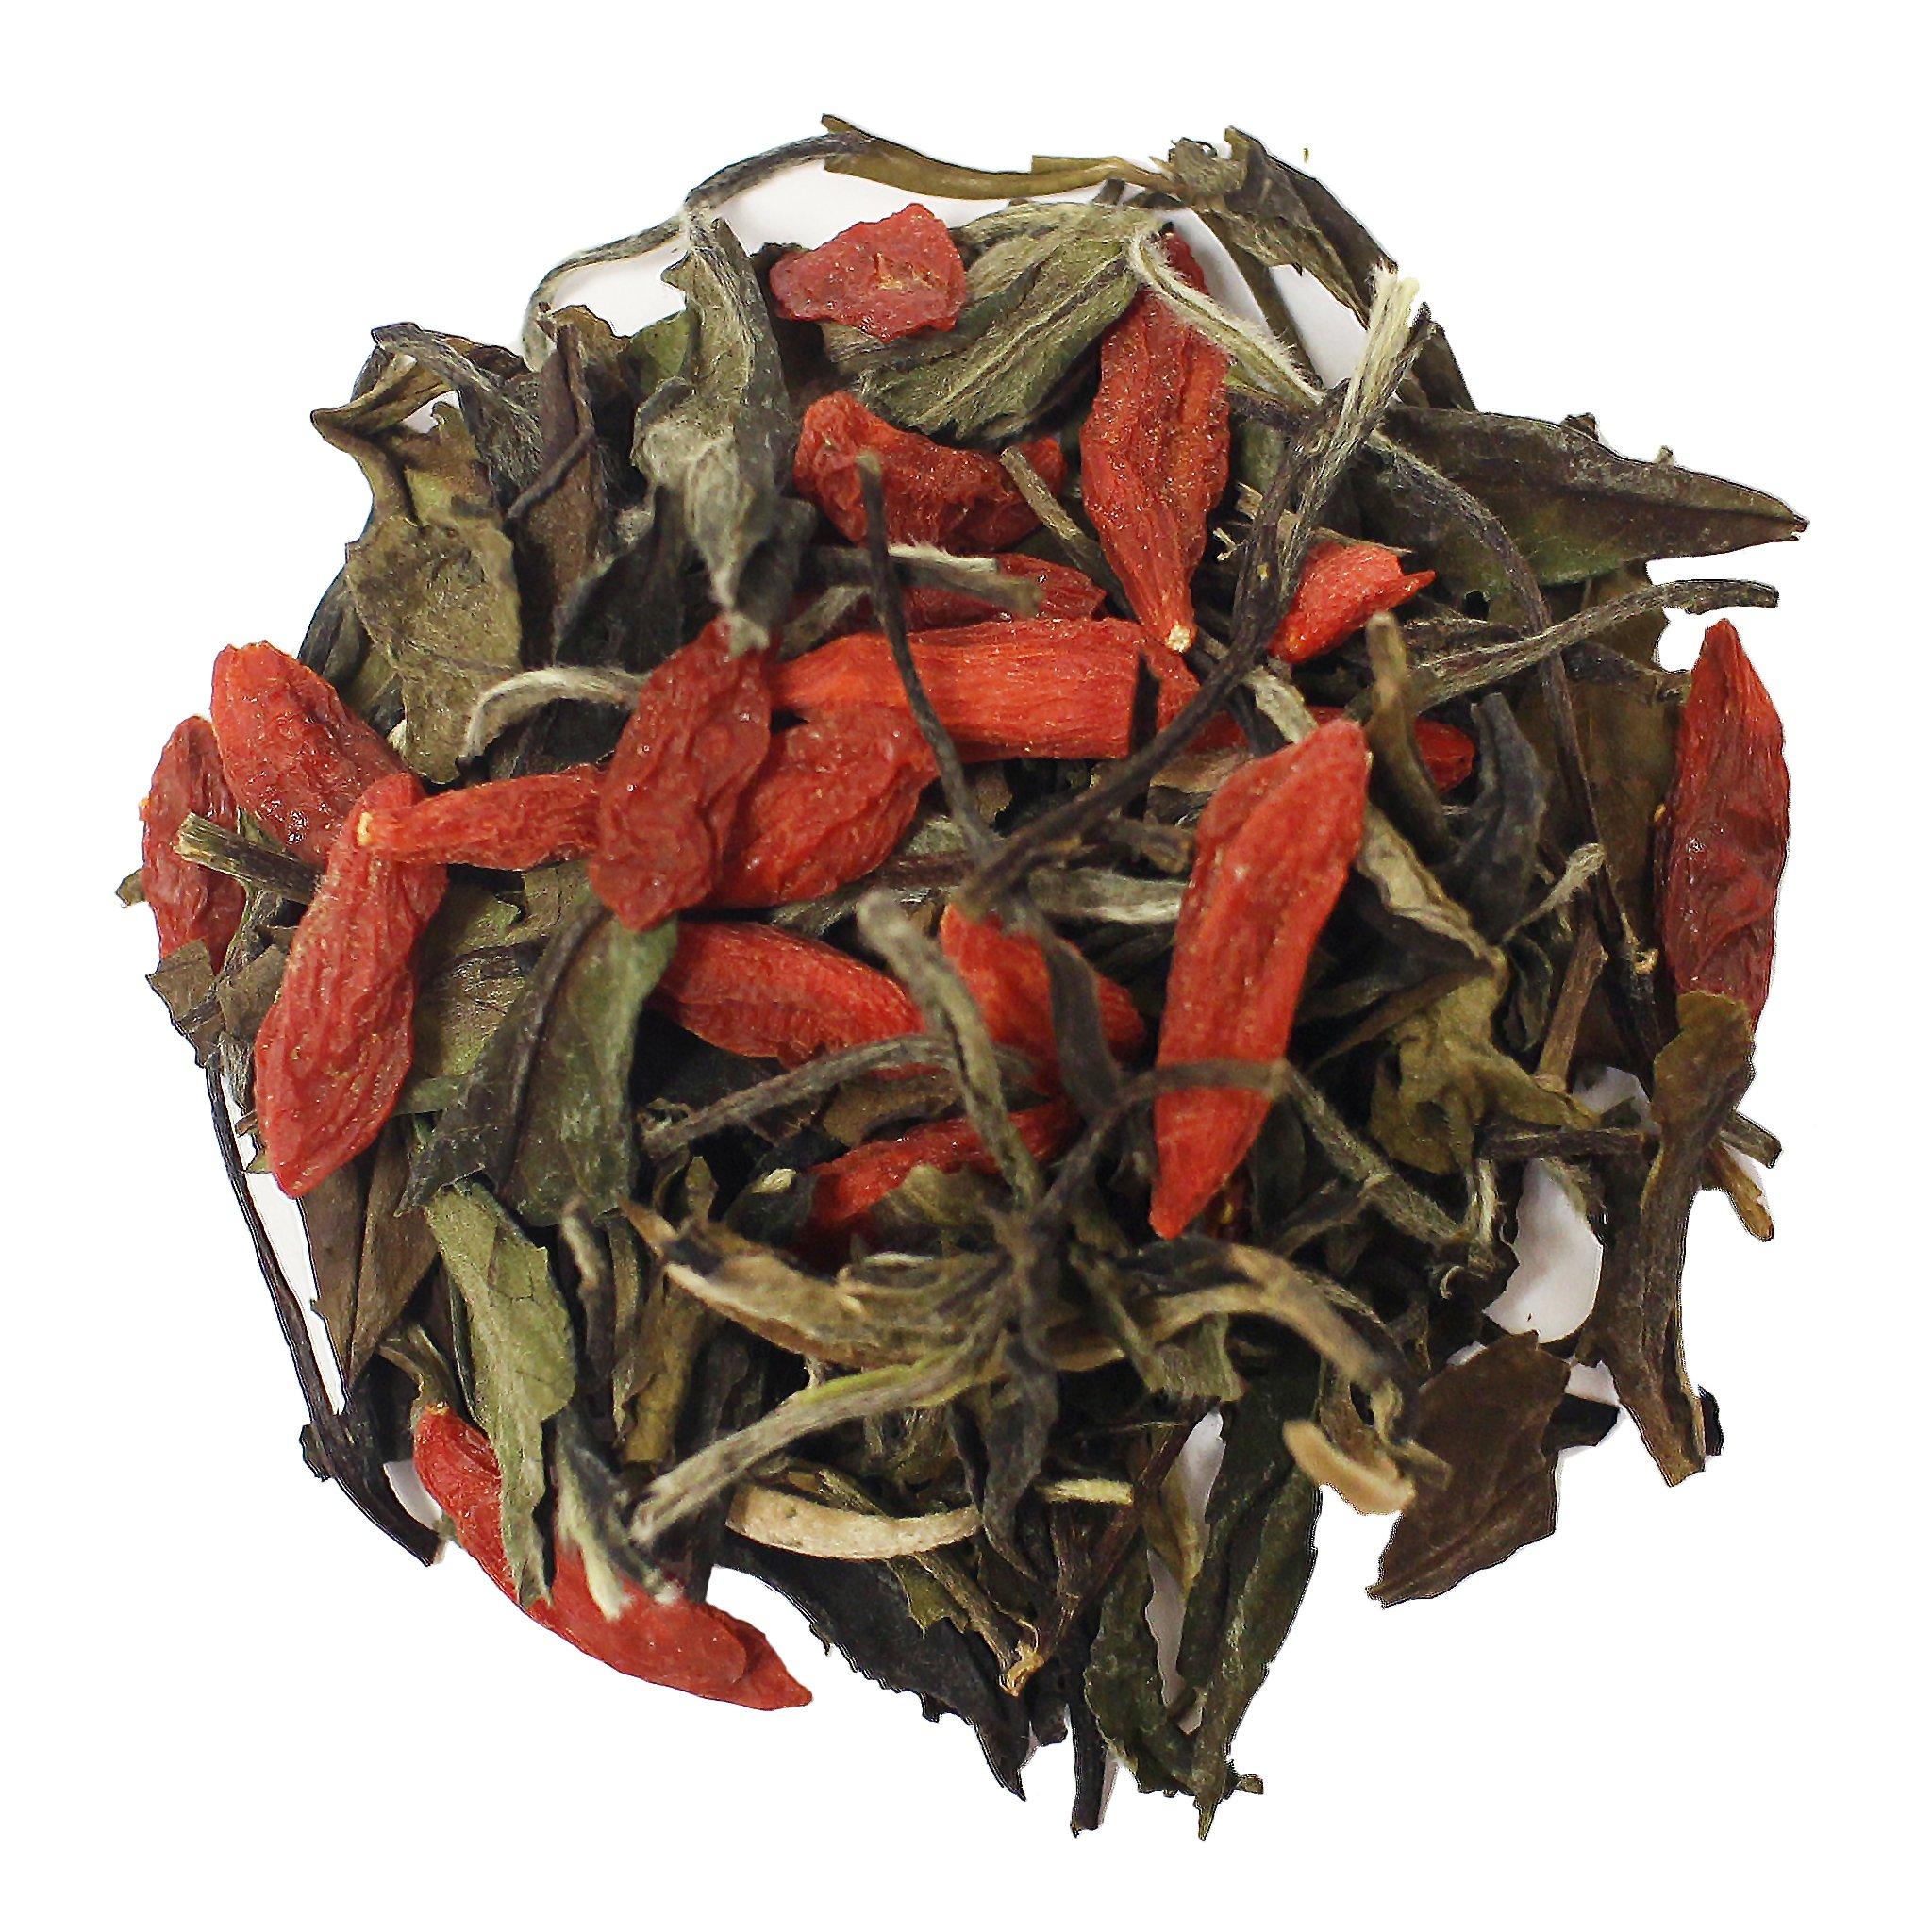 The Tea Farm - Goji White Tea - Loose Leaf White Tea (8 Ounce Bag) by The Tea Farm